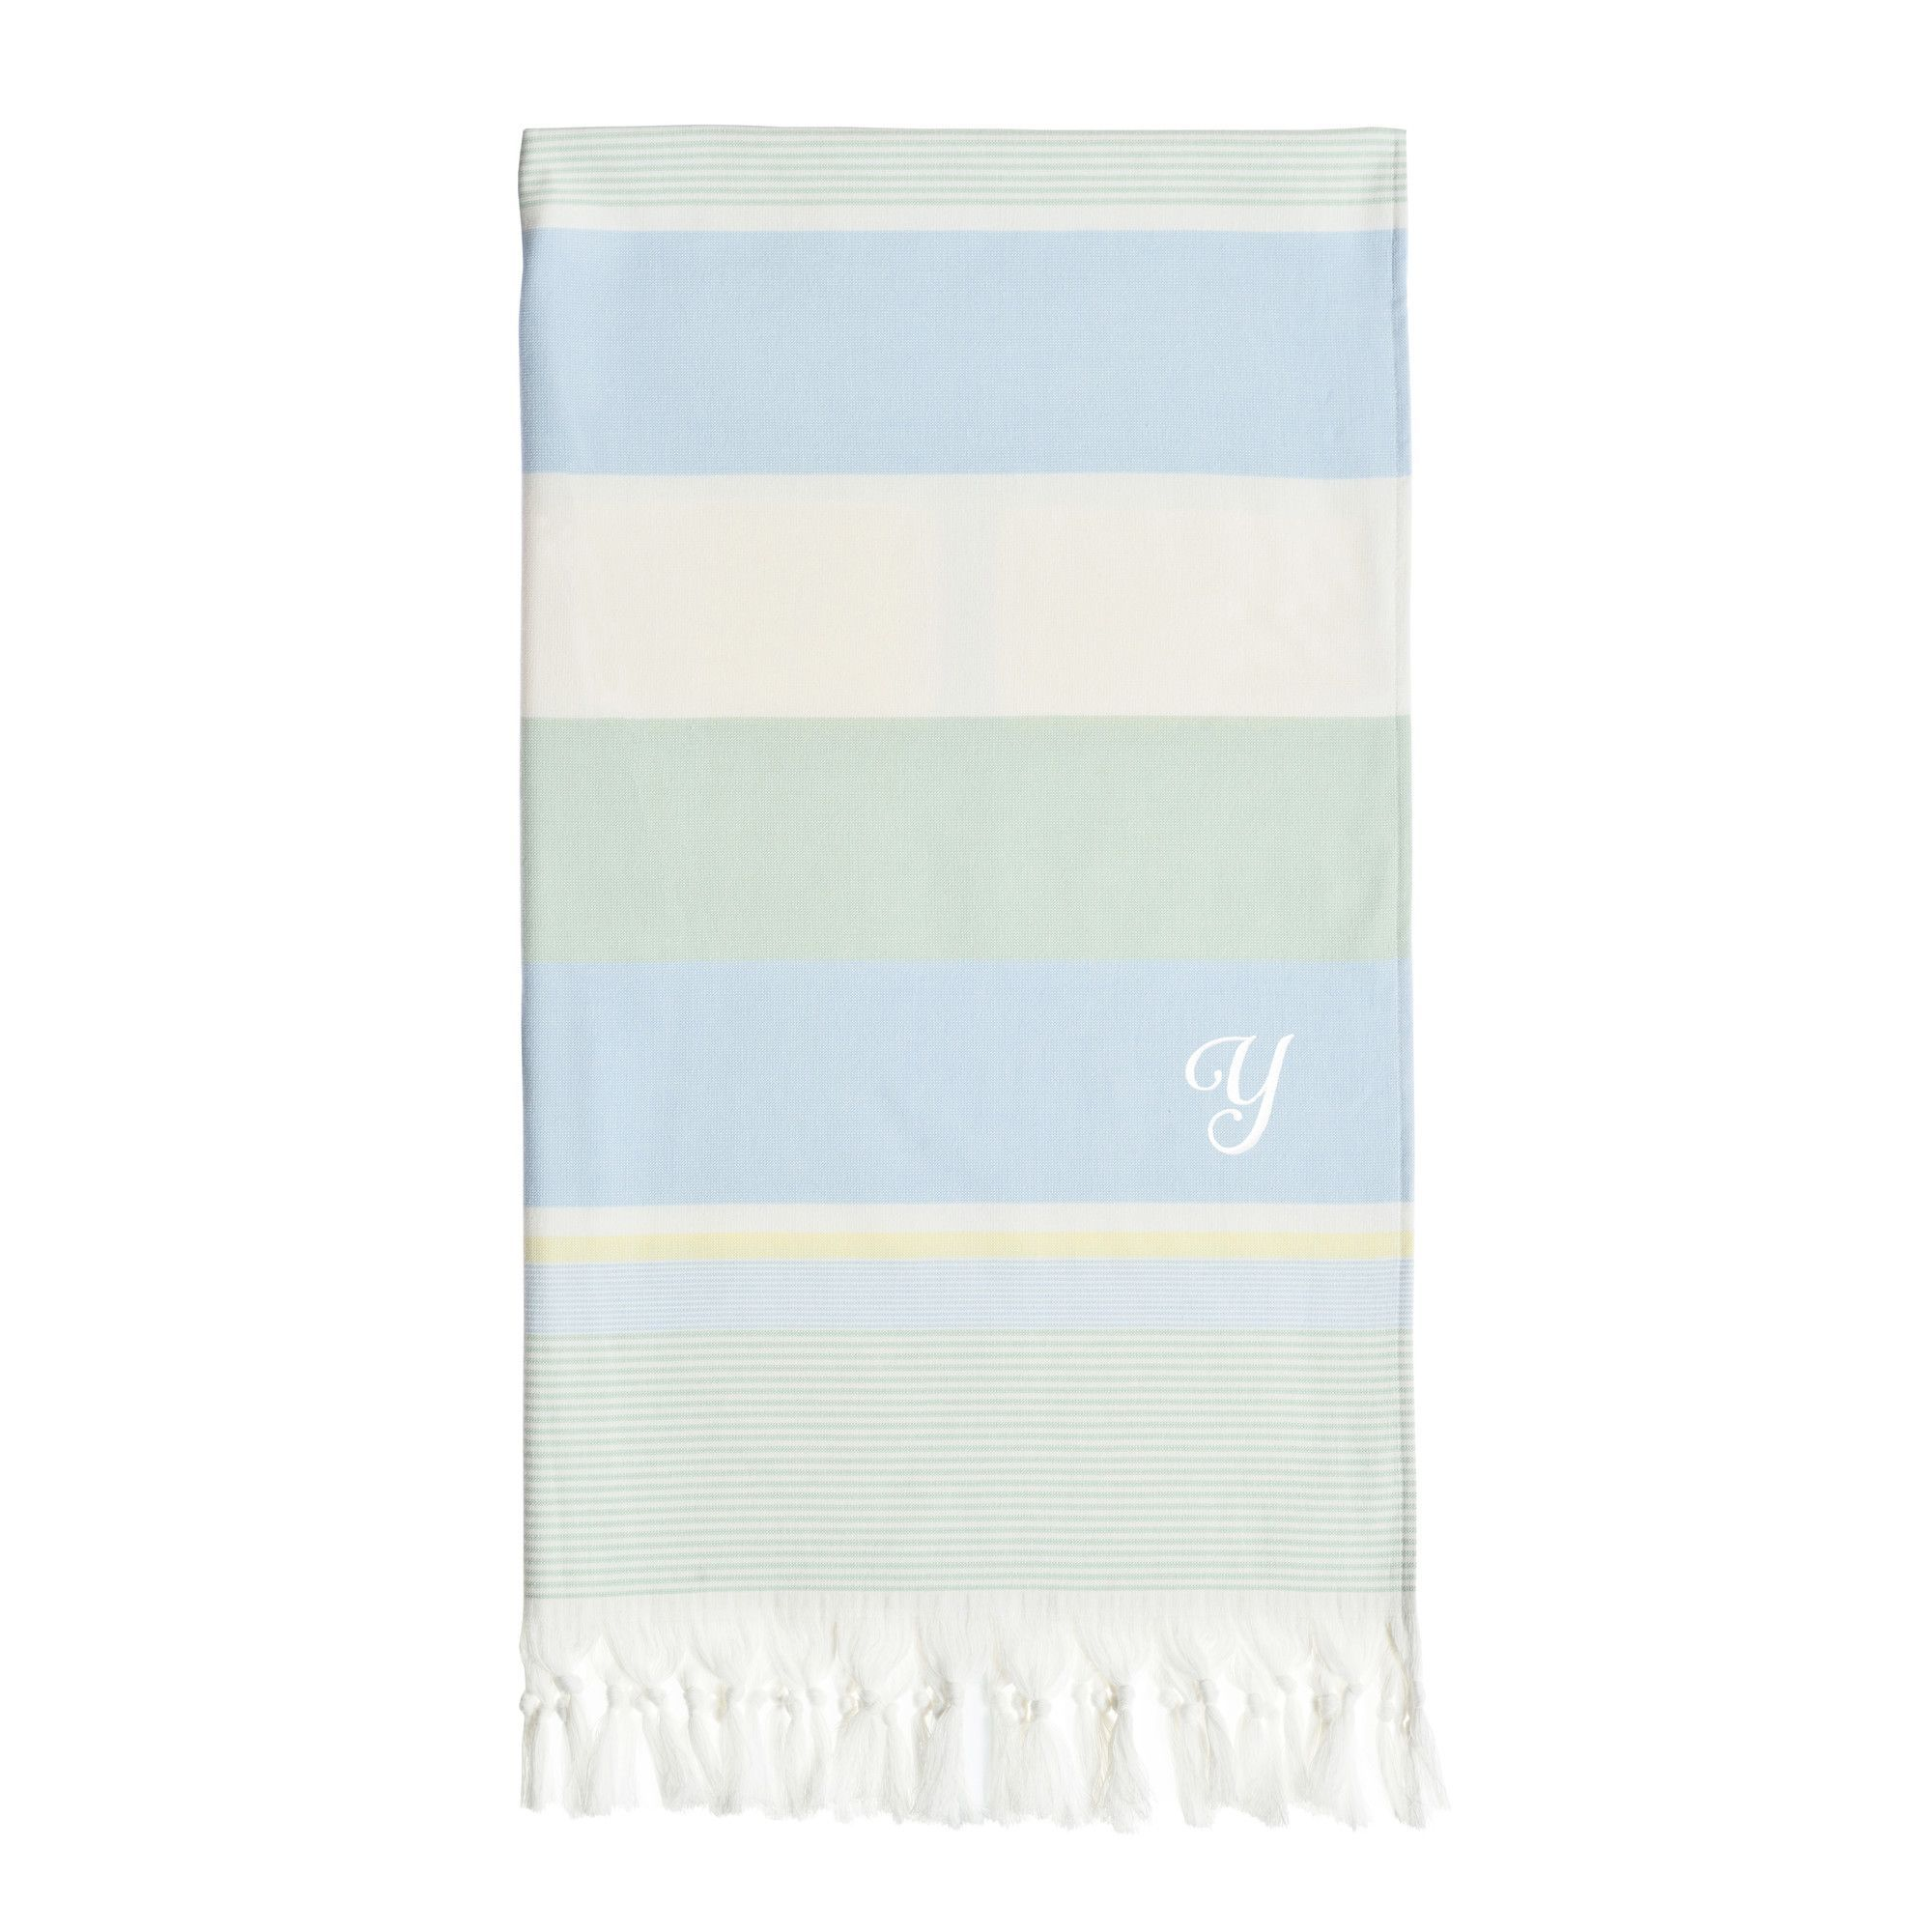 Arias 24 Piece 100 Cotton Towel Set Beach Towel Summer Of Love Towel